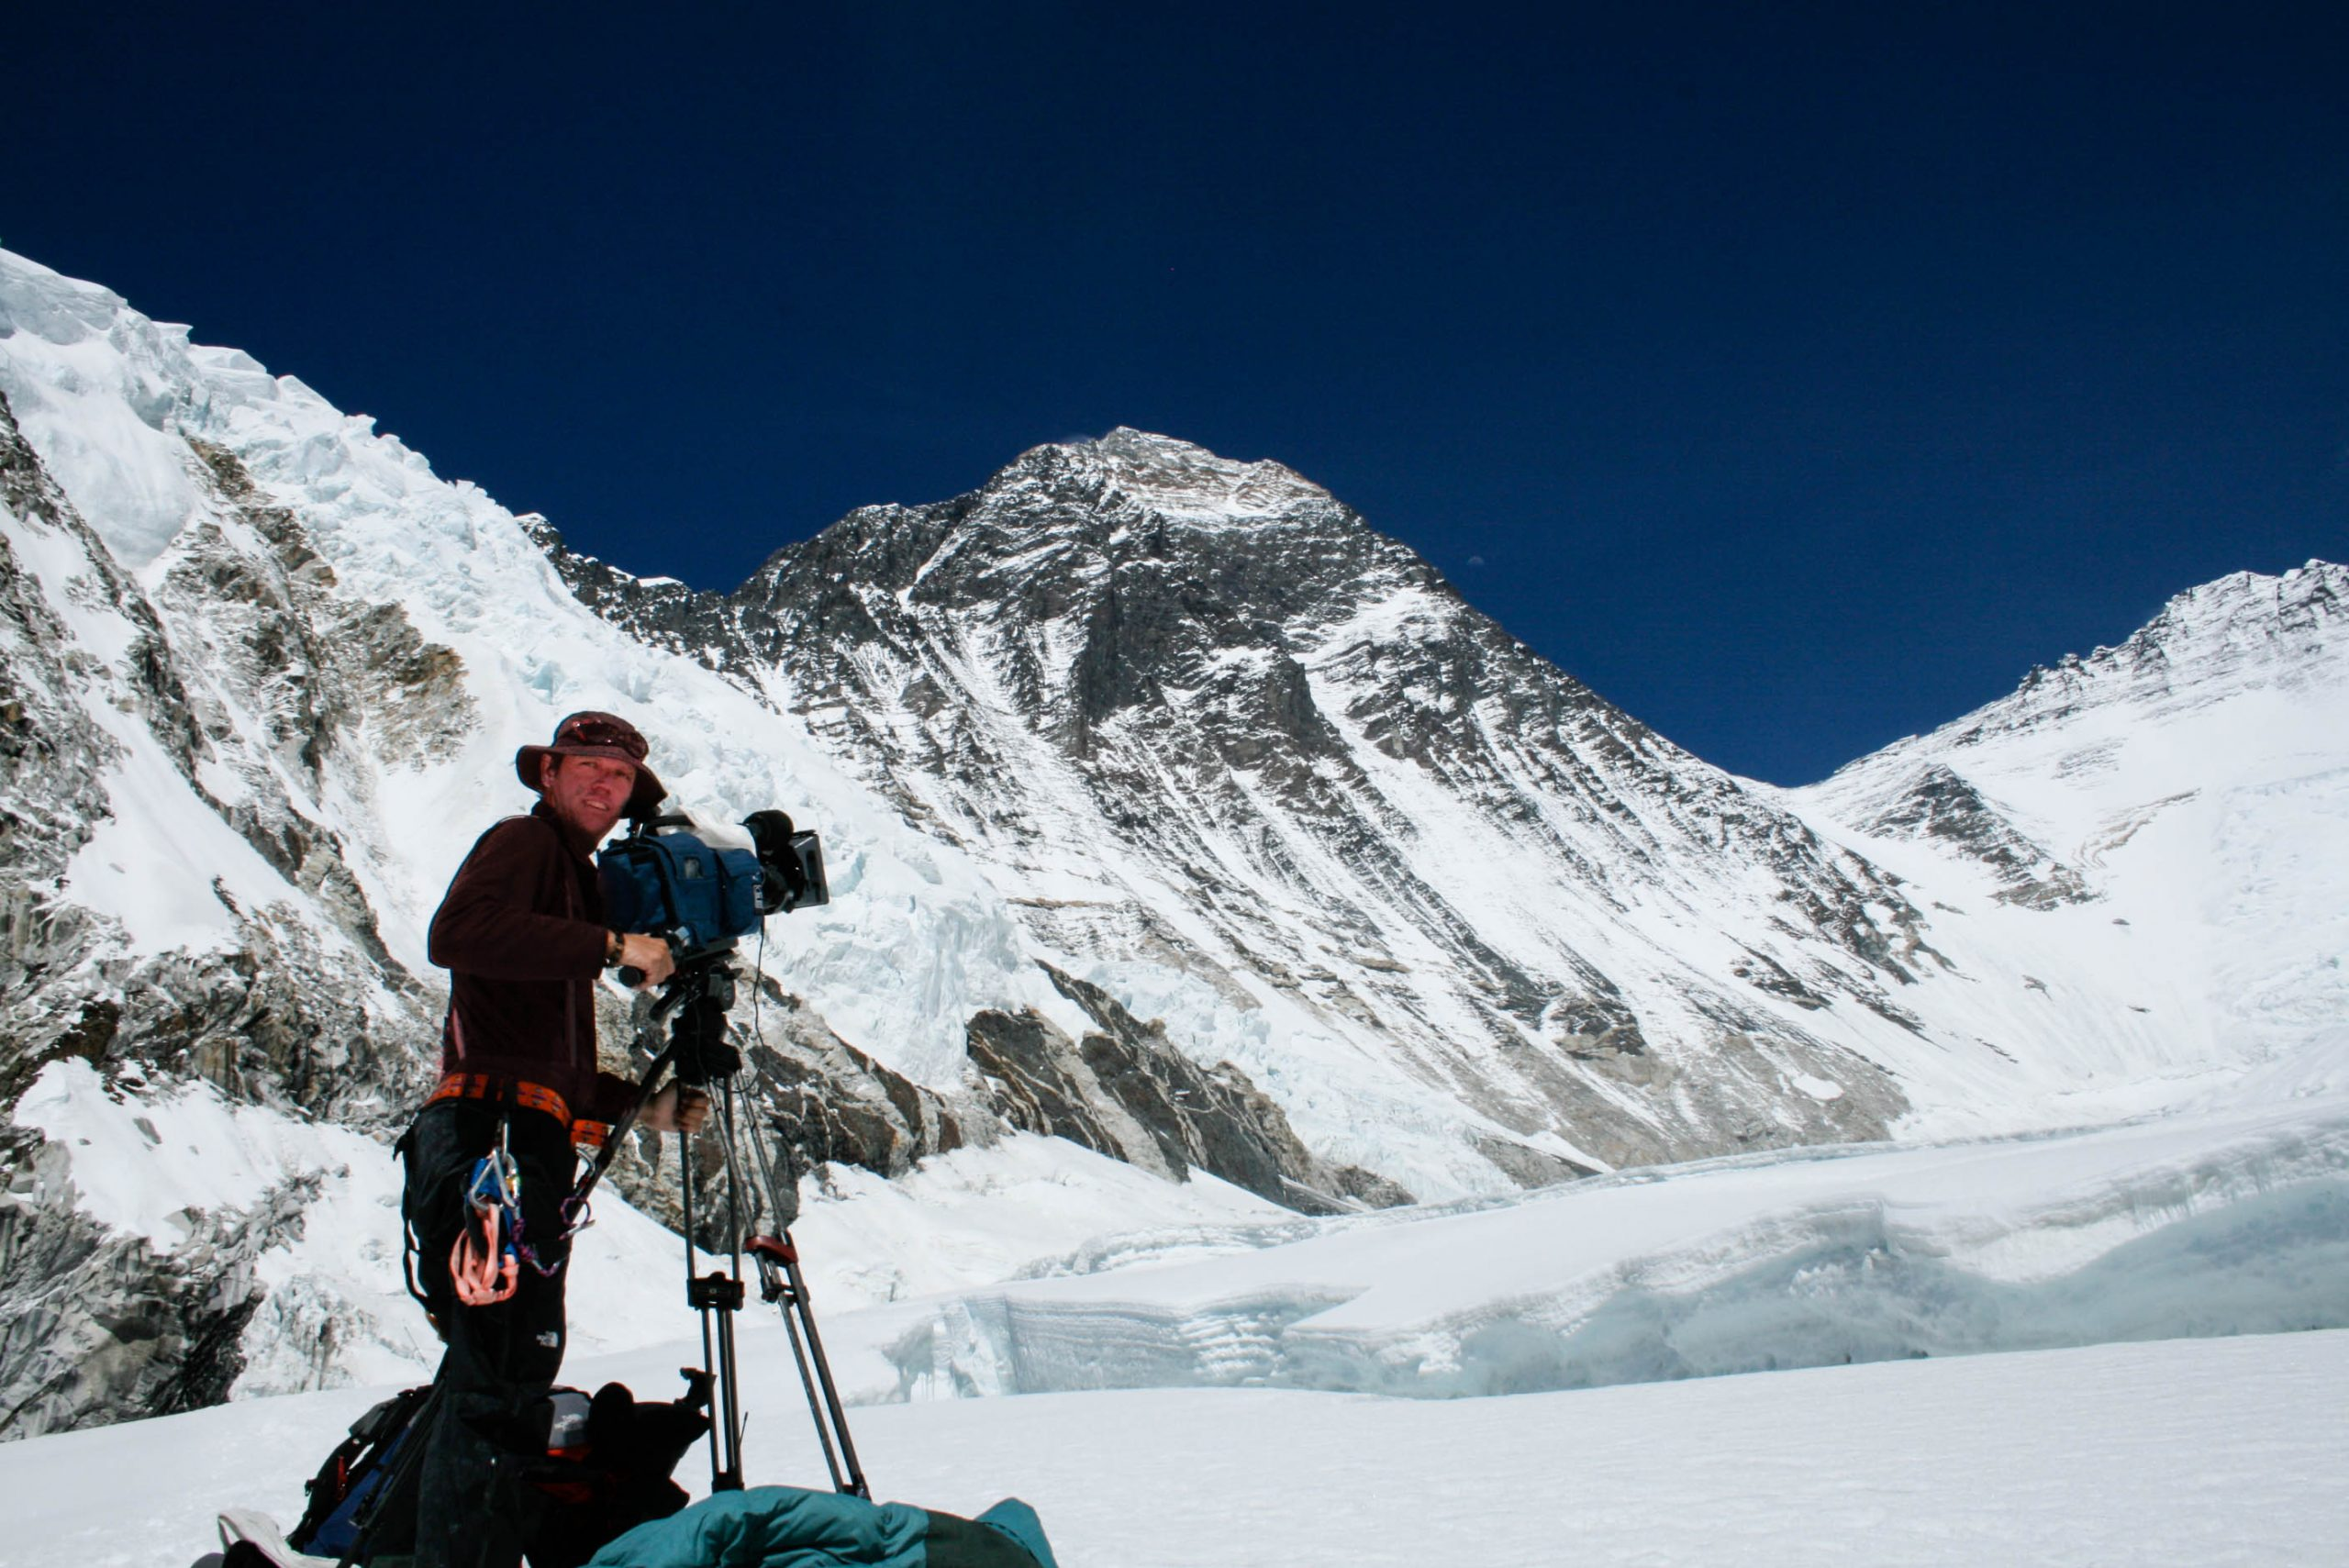 Tim Butt Cameraman Western Cwm Mt Everest Sony DVW 790 BBC Climbing